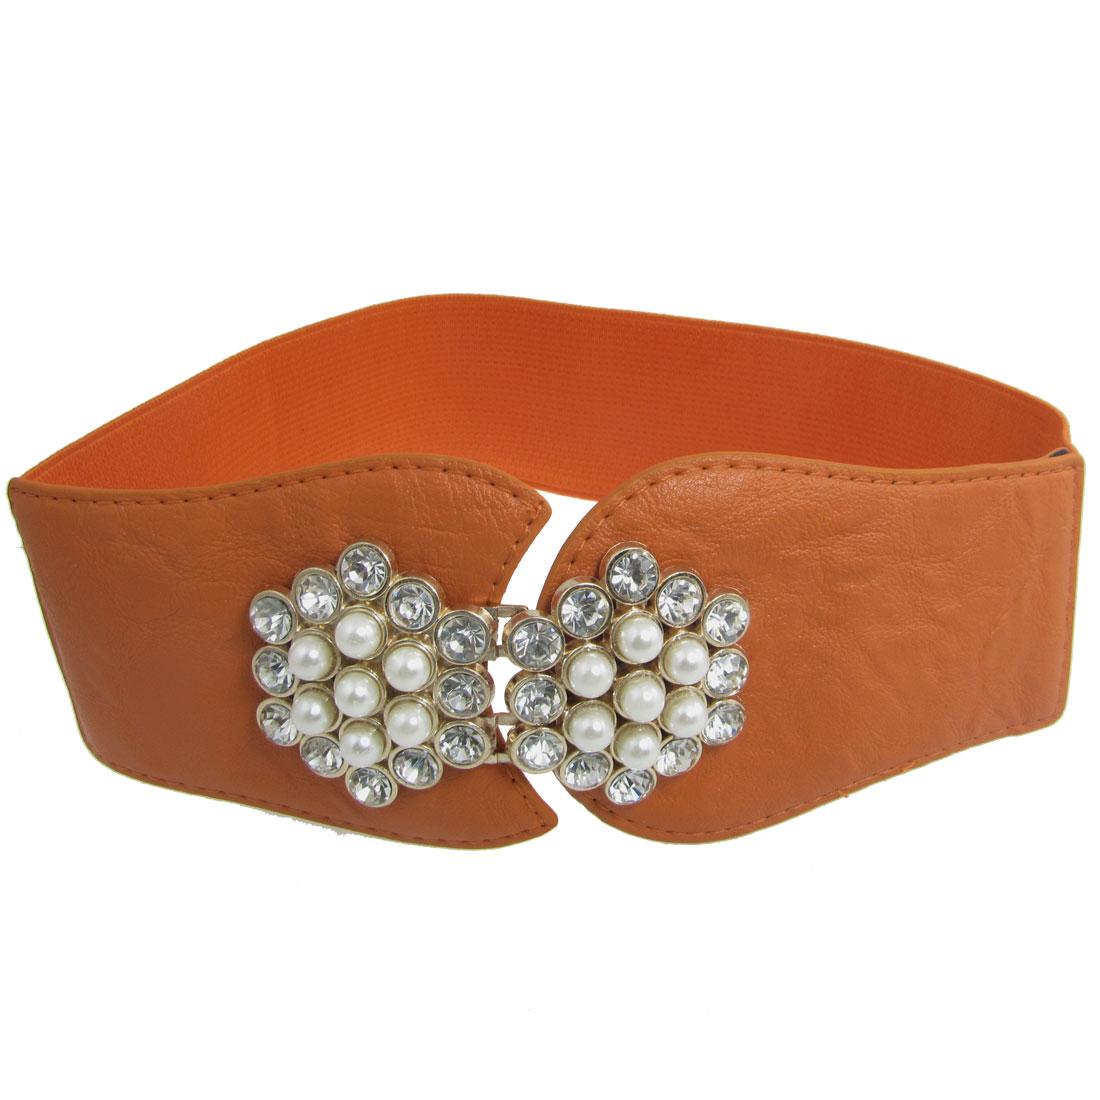 Ladies Plastic Crystals Decor Interlocking Buckle Waist Belt Orange